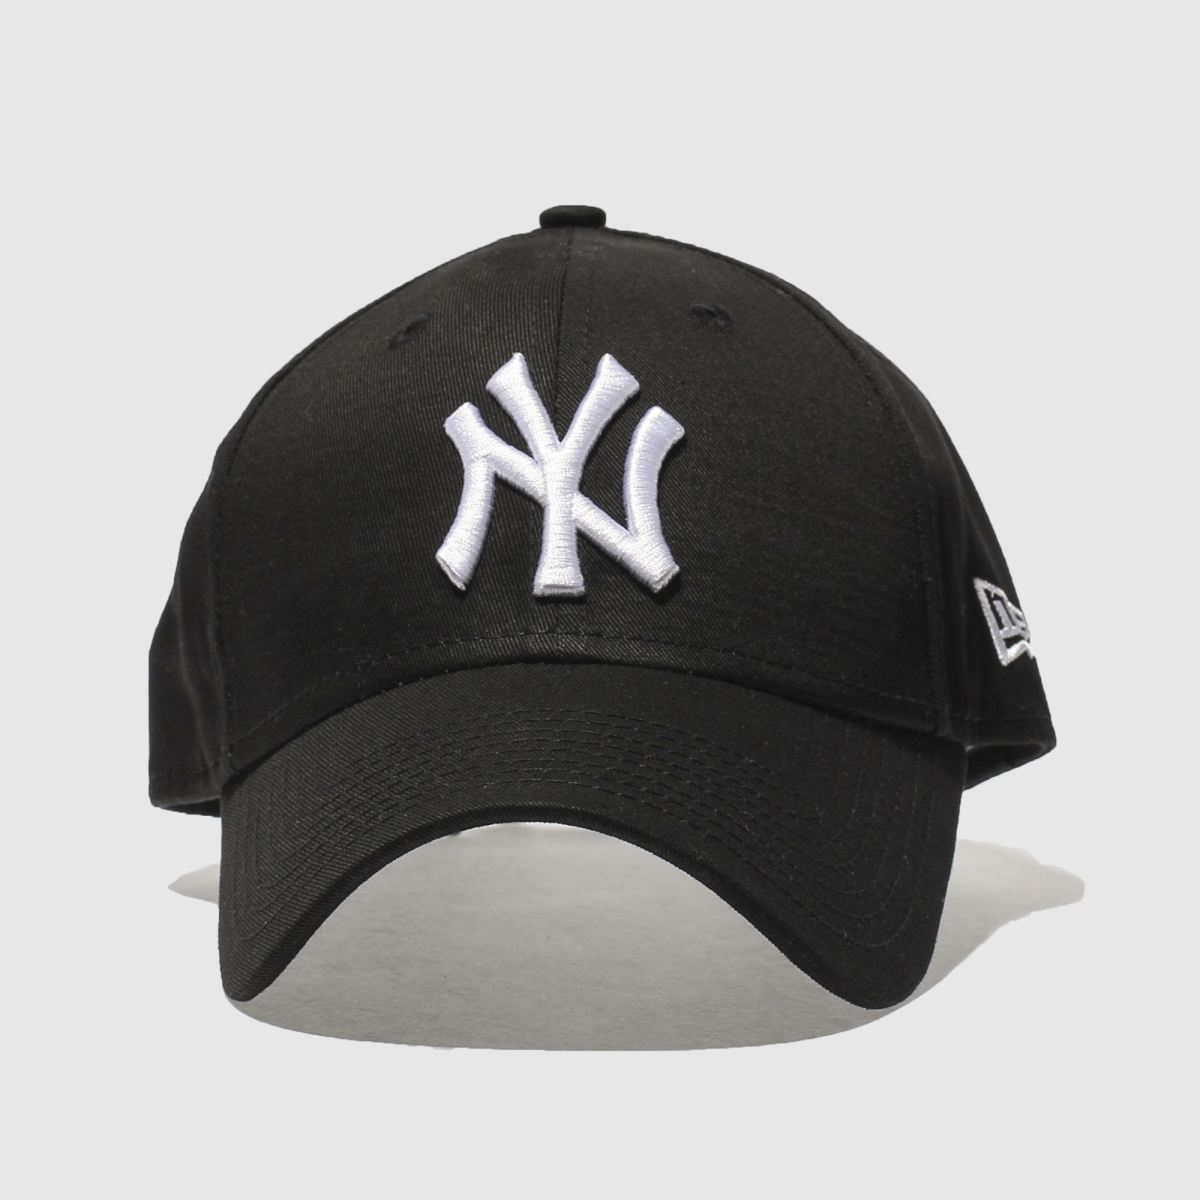 New Era Hat Black